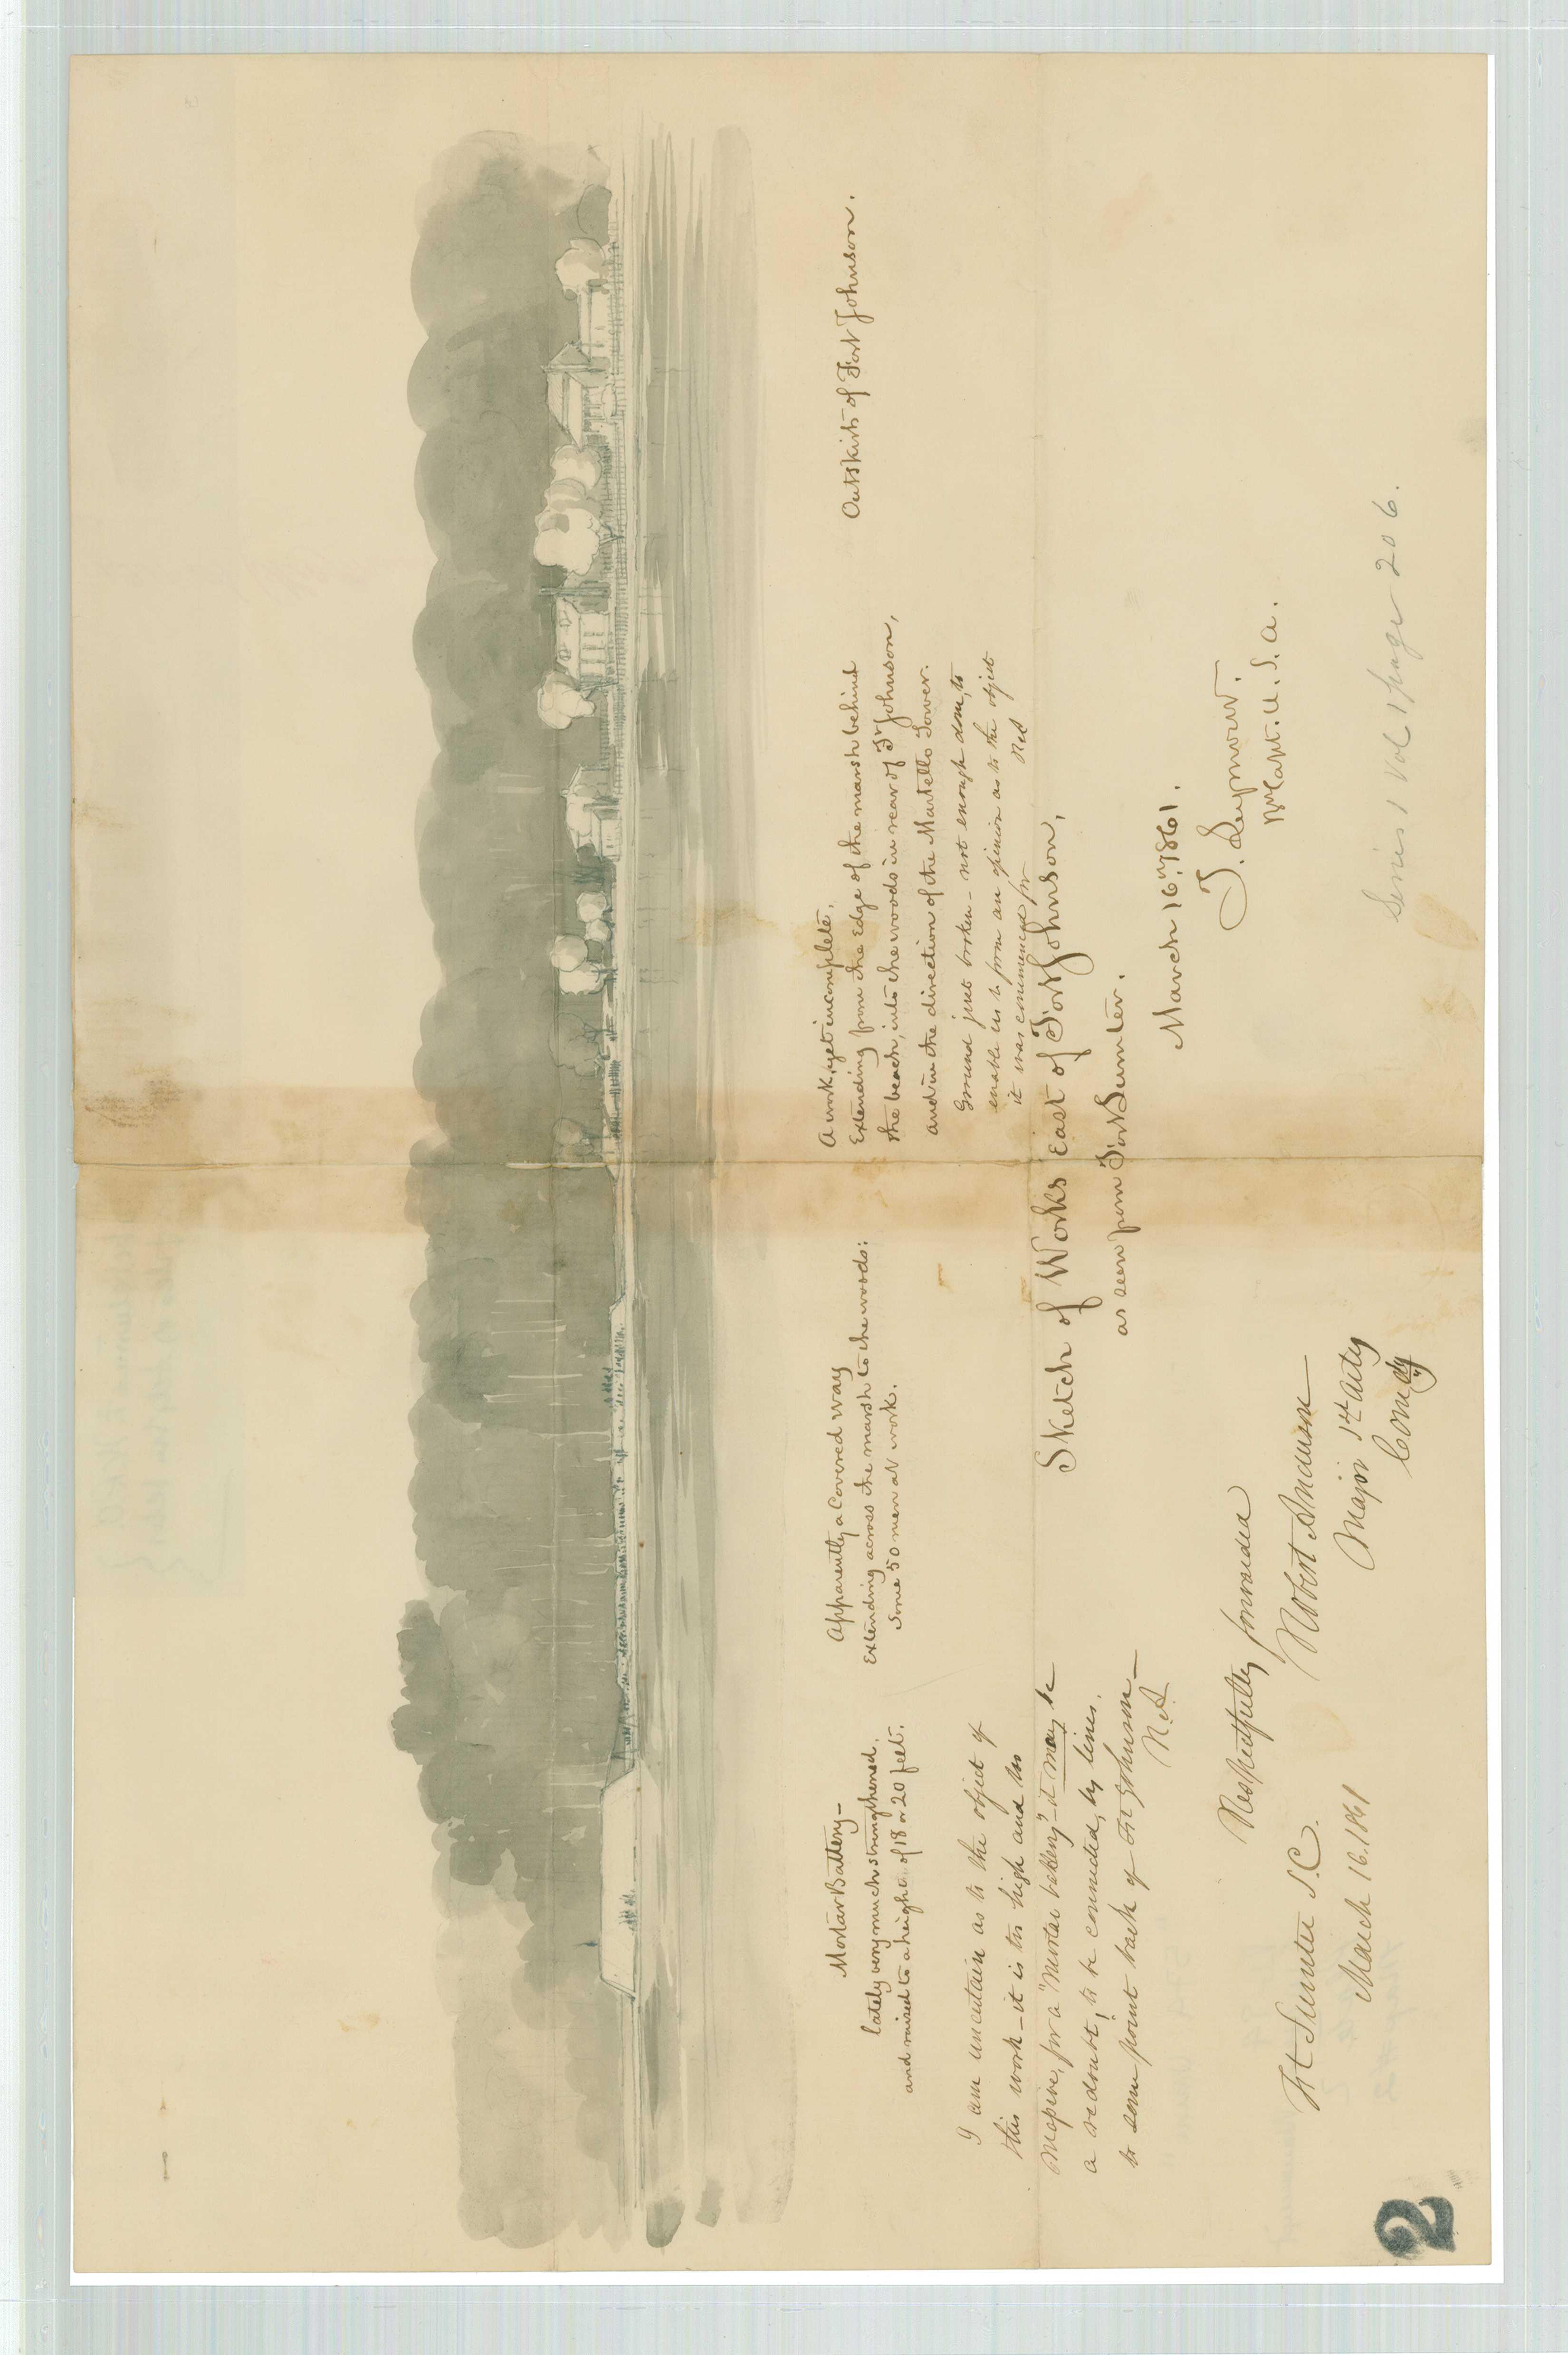 rg94_manuscript_plate2_map2_front